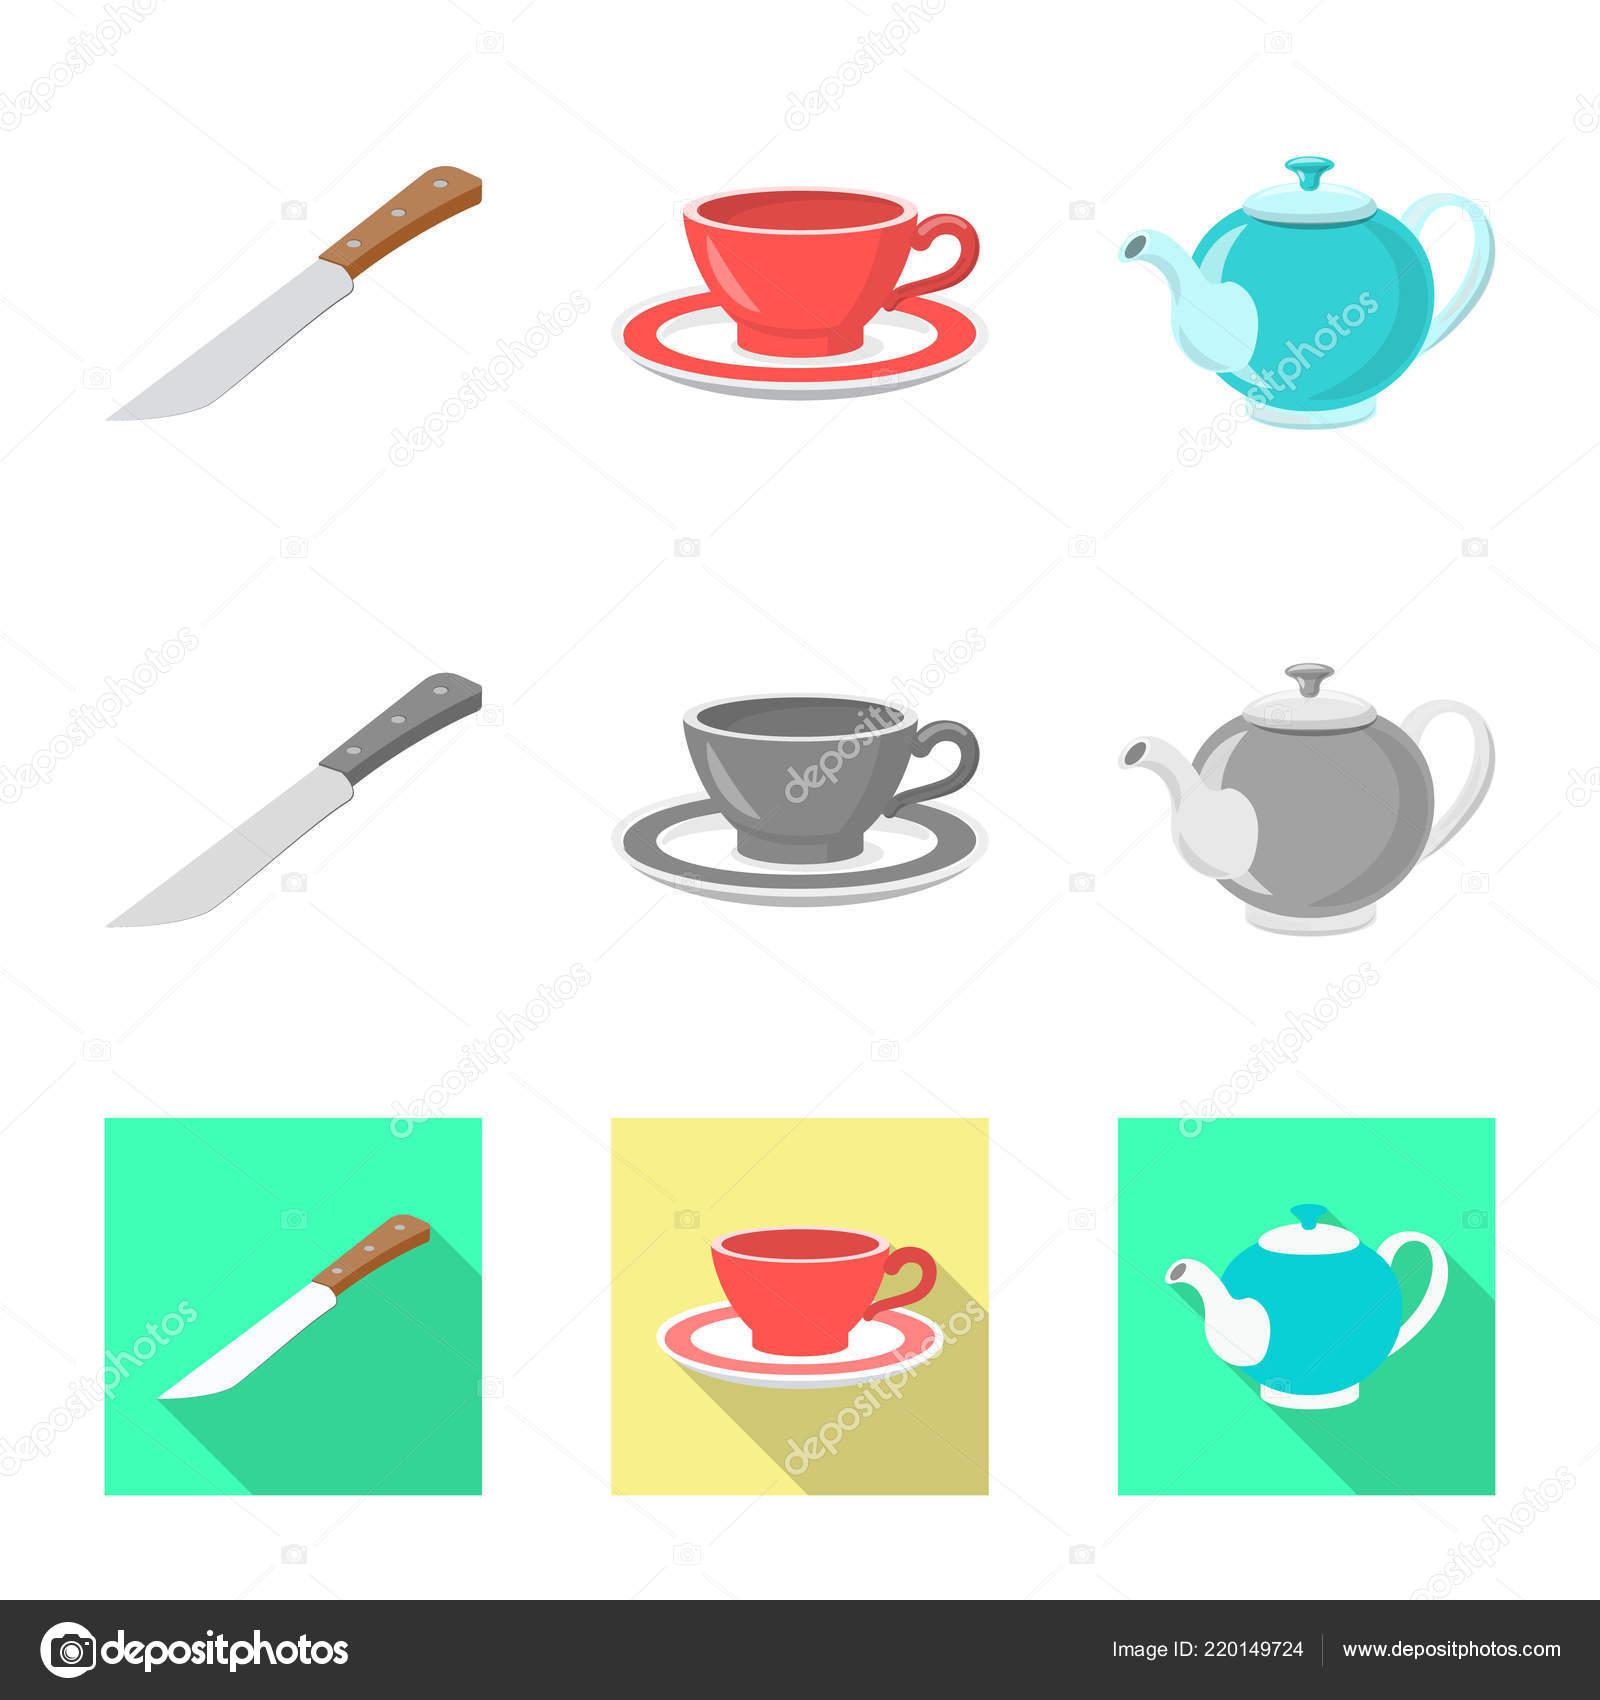 in stock kitchens modular kitchen usa 厨房和厨师象征的向量例证 库存厨房和家电矢量图标收藏 图库矢量图像